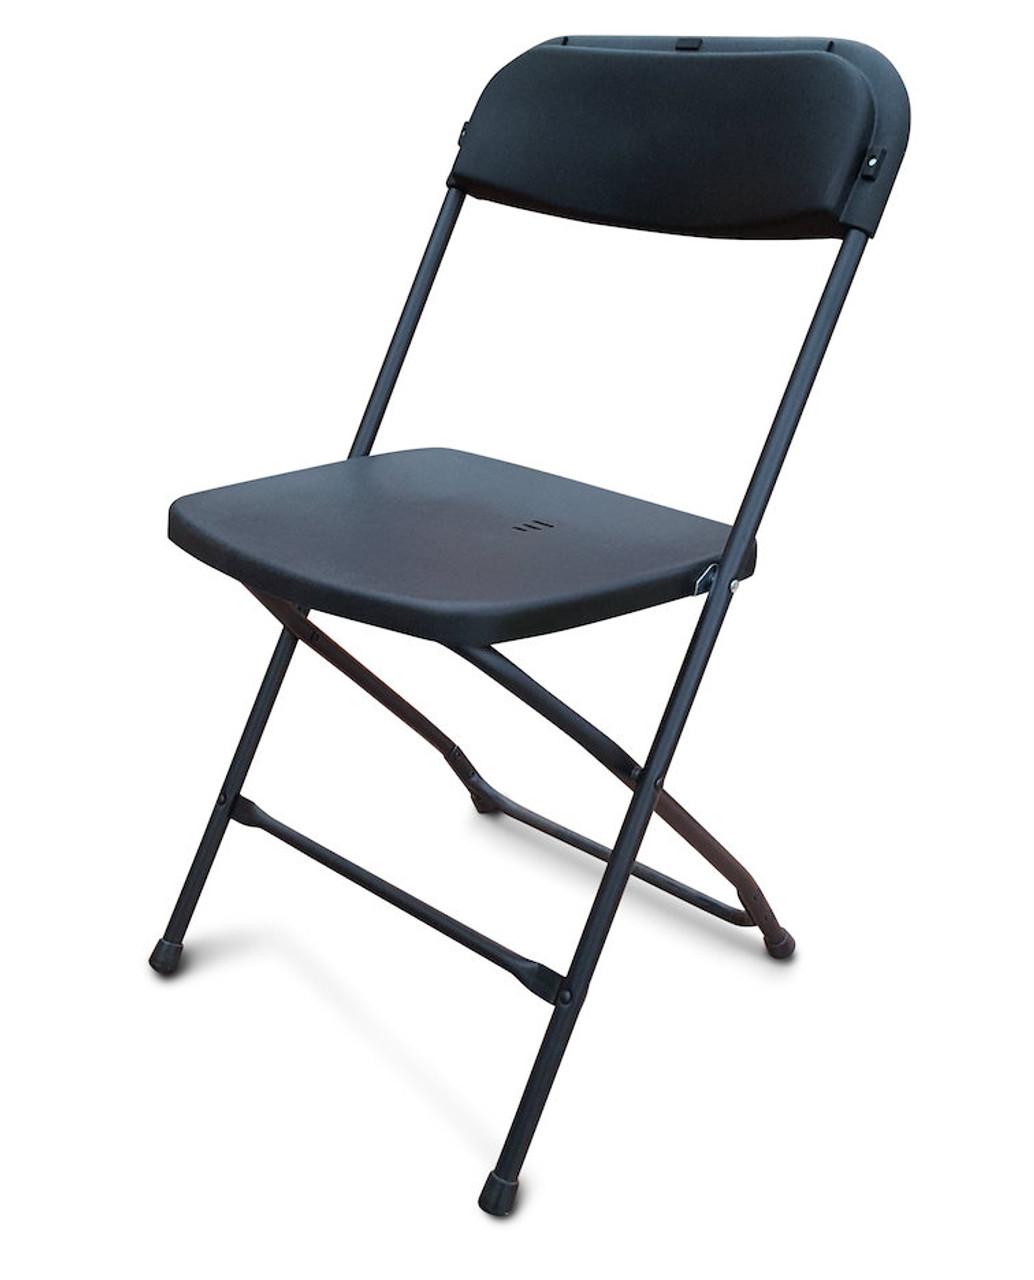 Folding Plastic Chairs Ex Australian Gold Coast Commonwealth Games